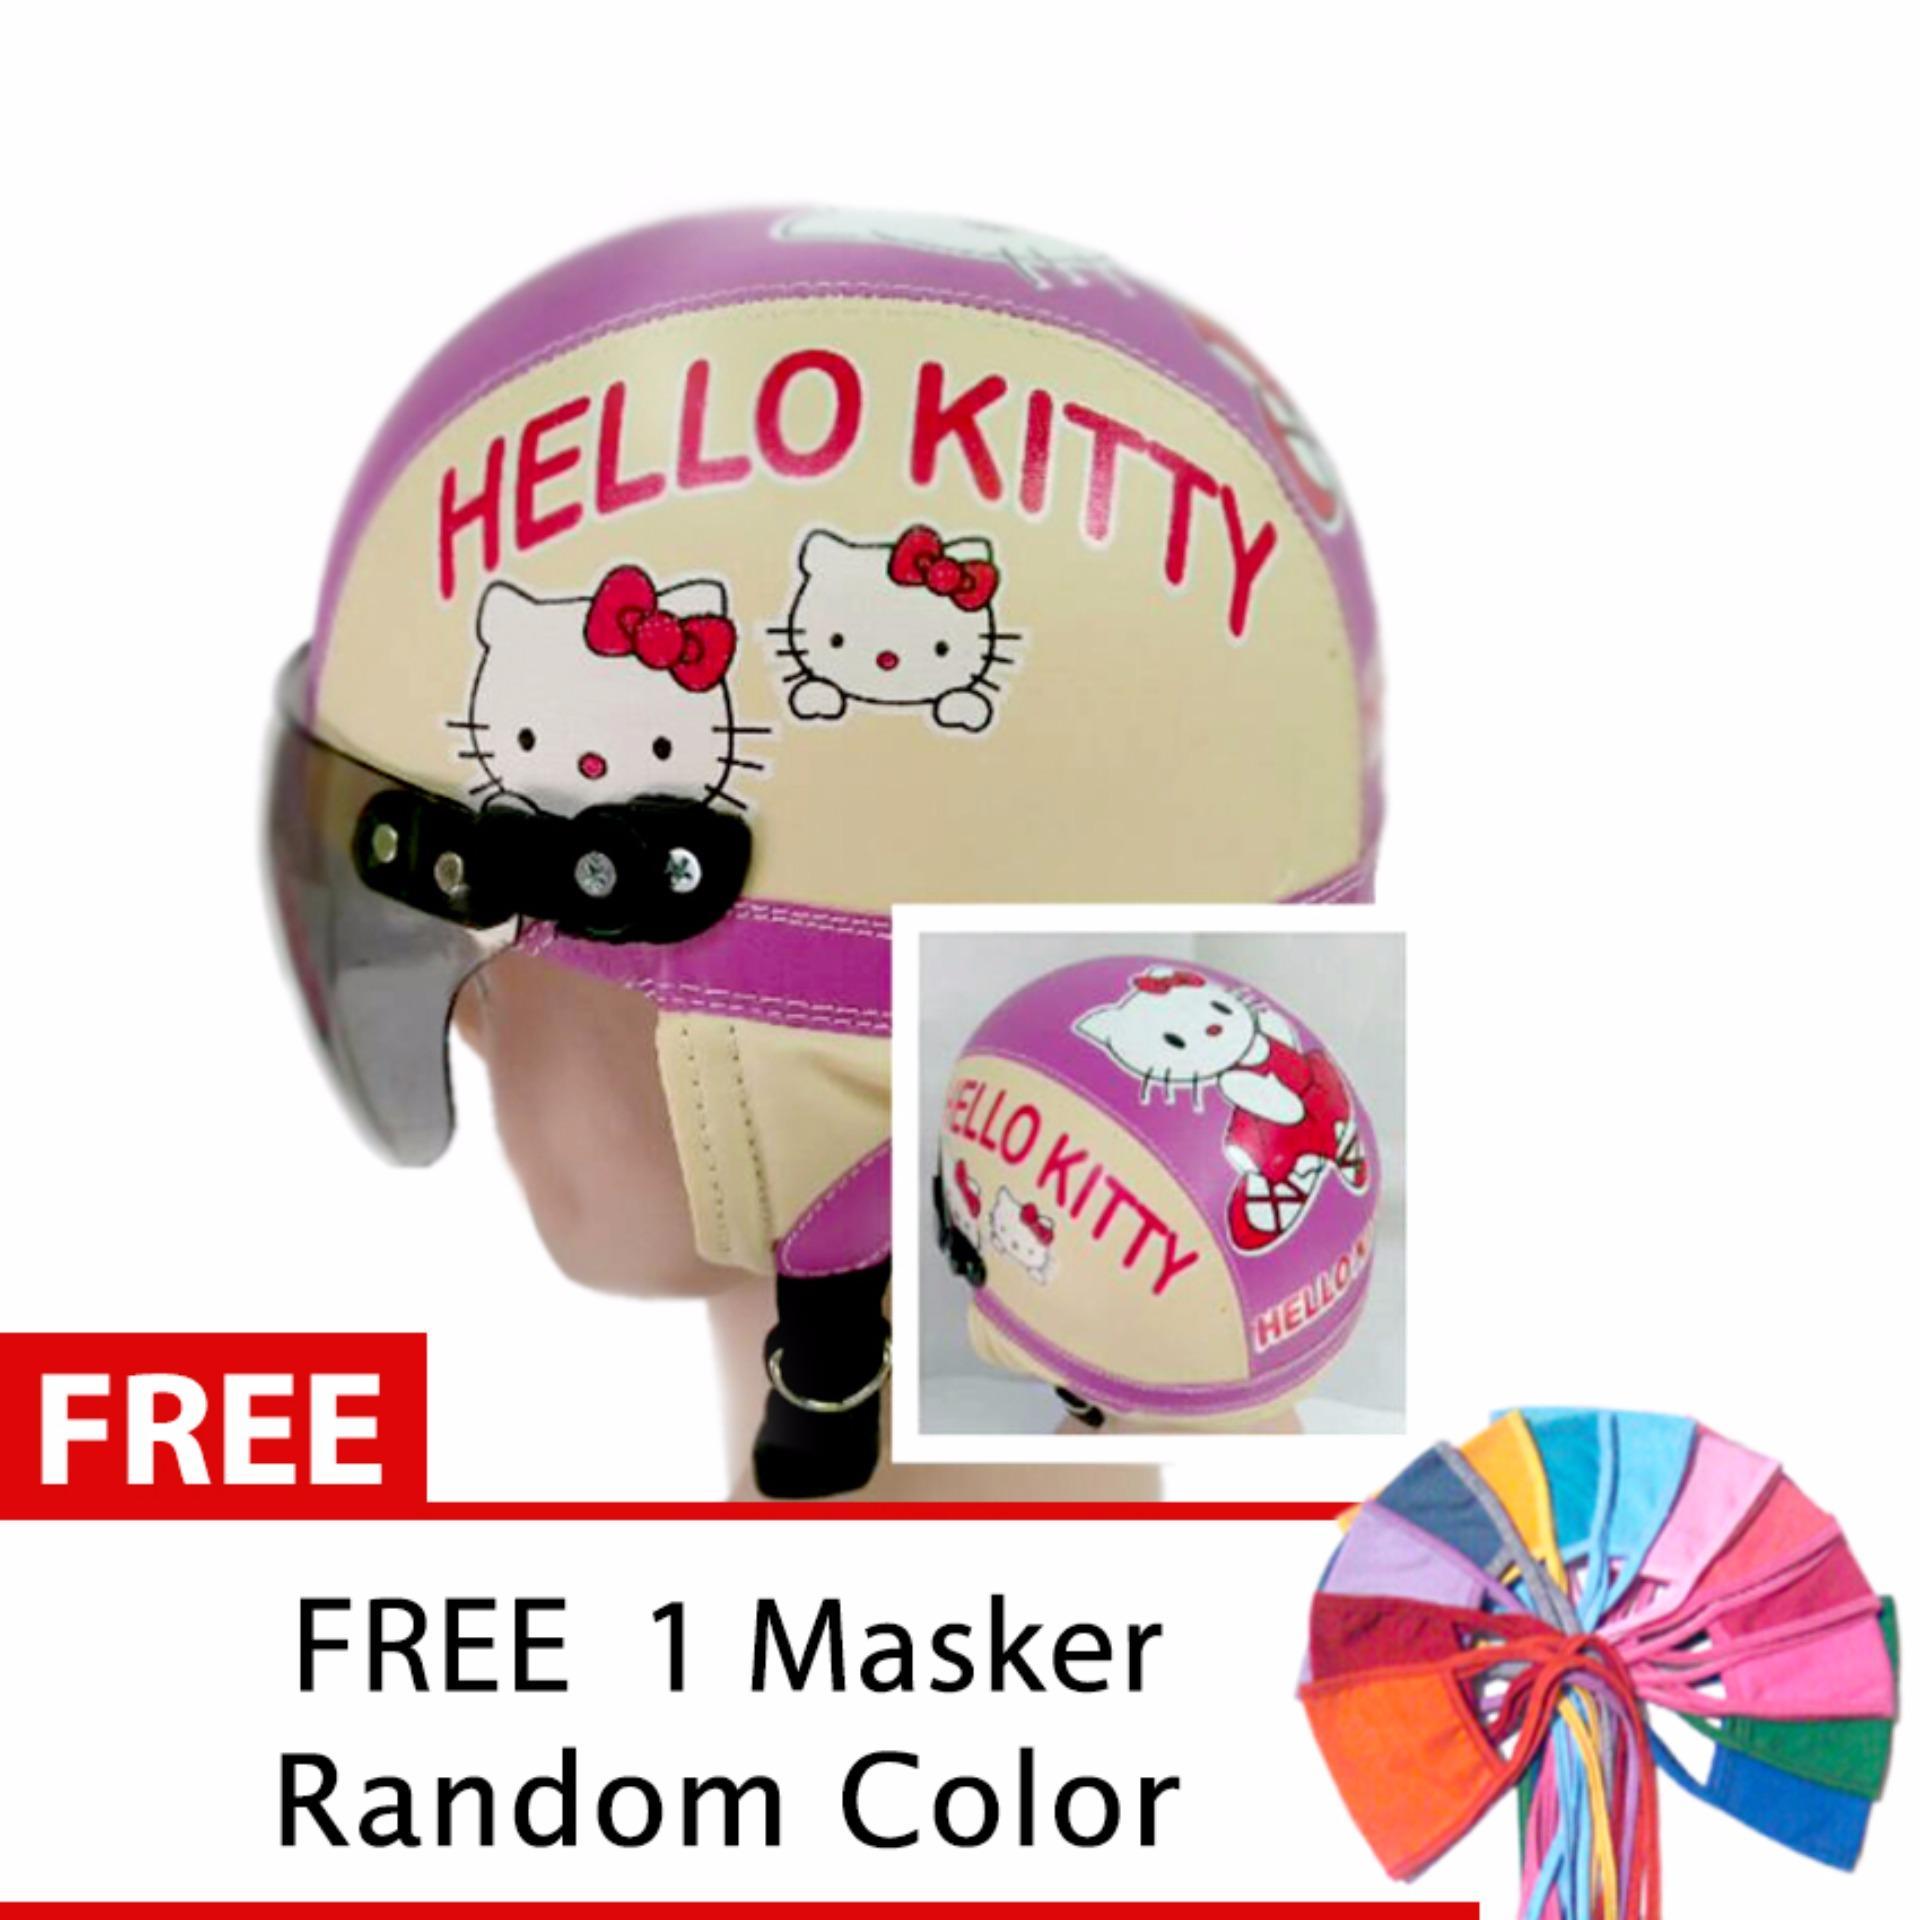 Beli Toserba Helm Anak Lucu Usia 1 4 Tahun Karakter Hello Kitty Cream Ungu Free Masker Mulut Nyicil